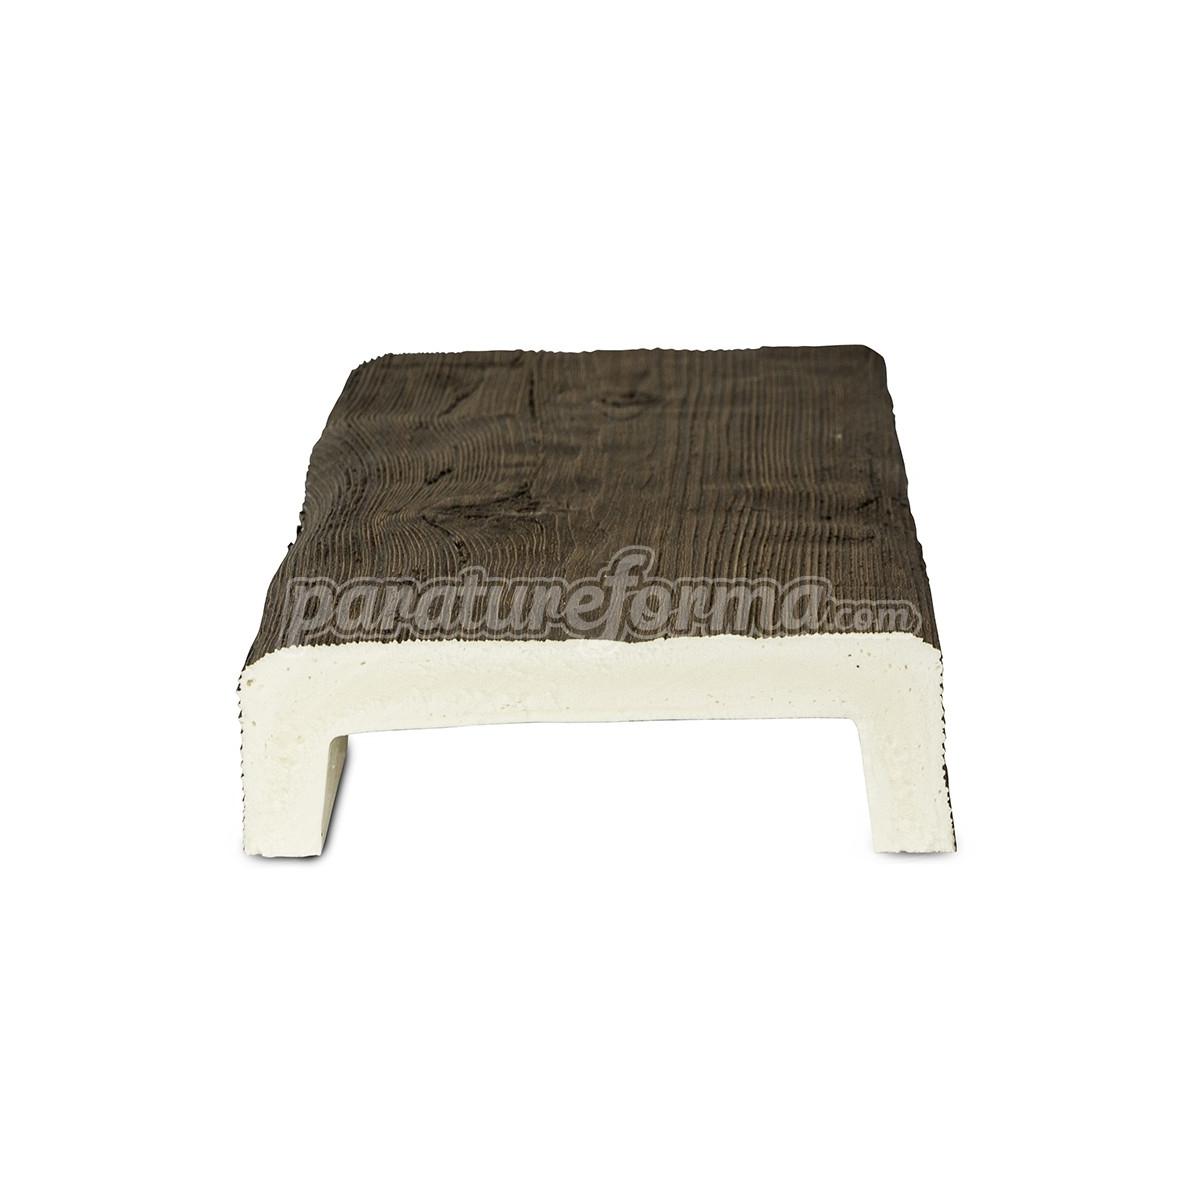 Grupo Unamacor Viga 300x16x4,5 imitación madera